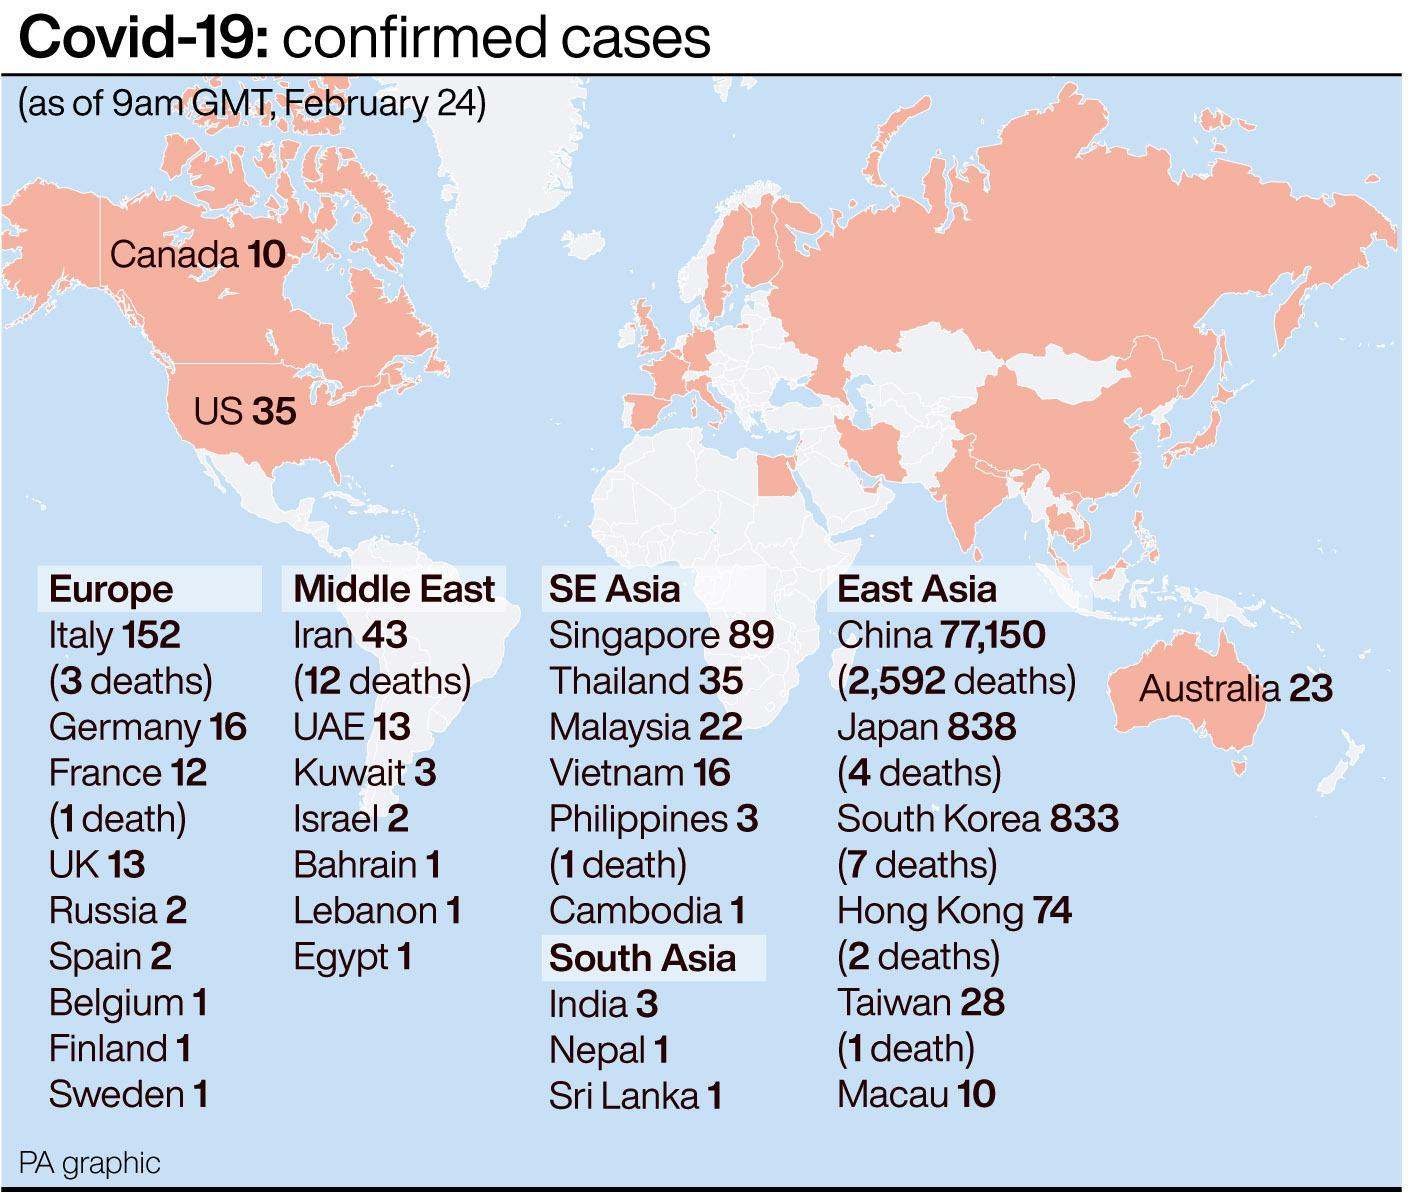 World Health Organization says no longer uses 'pandemic' category, but virus still emergency